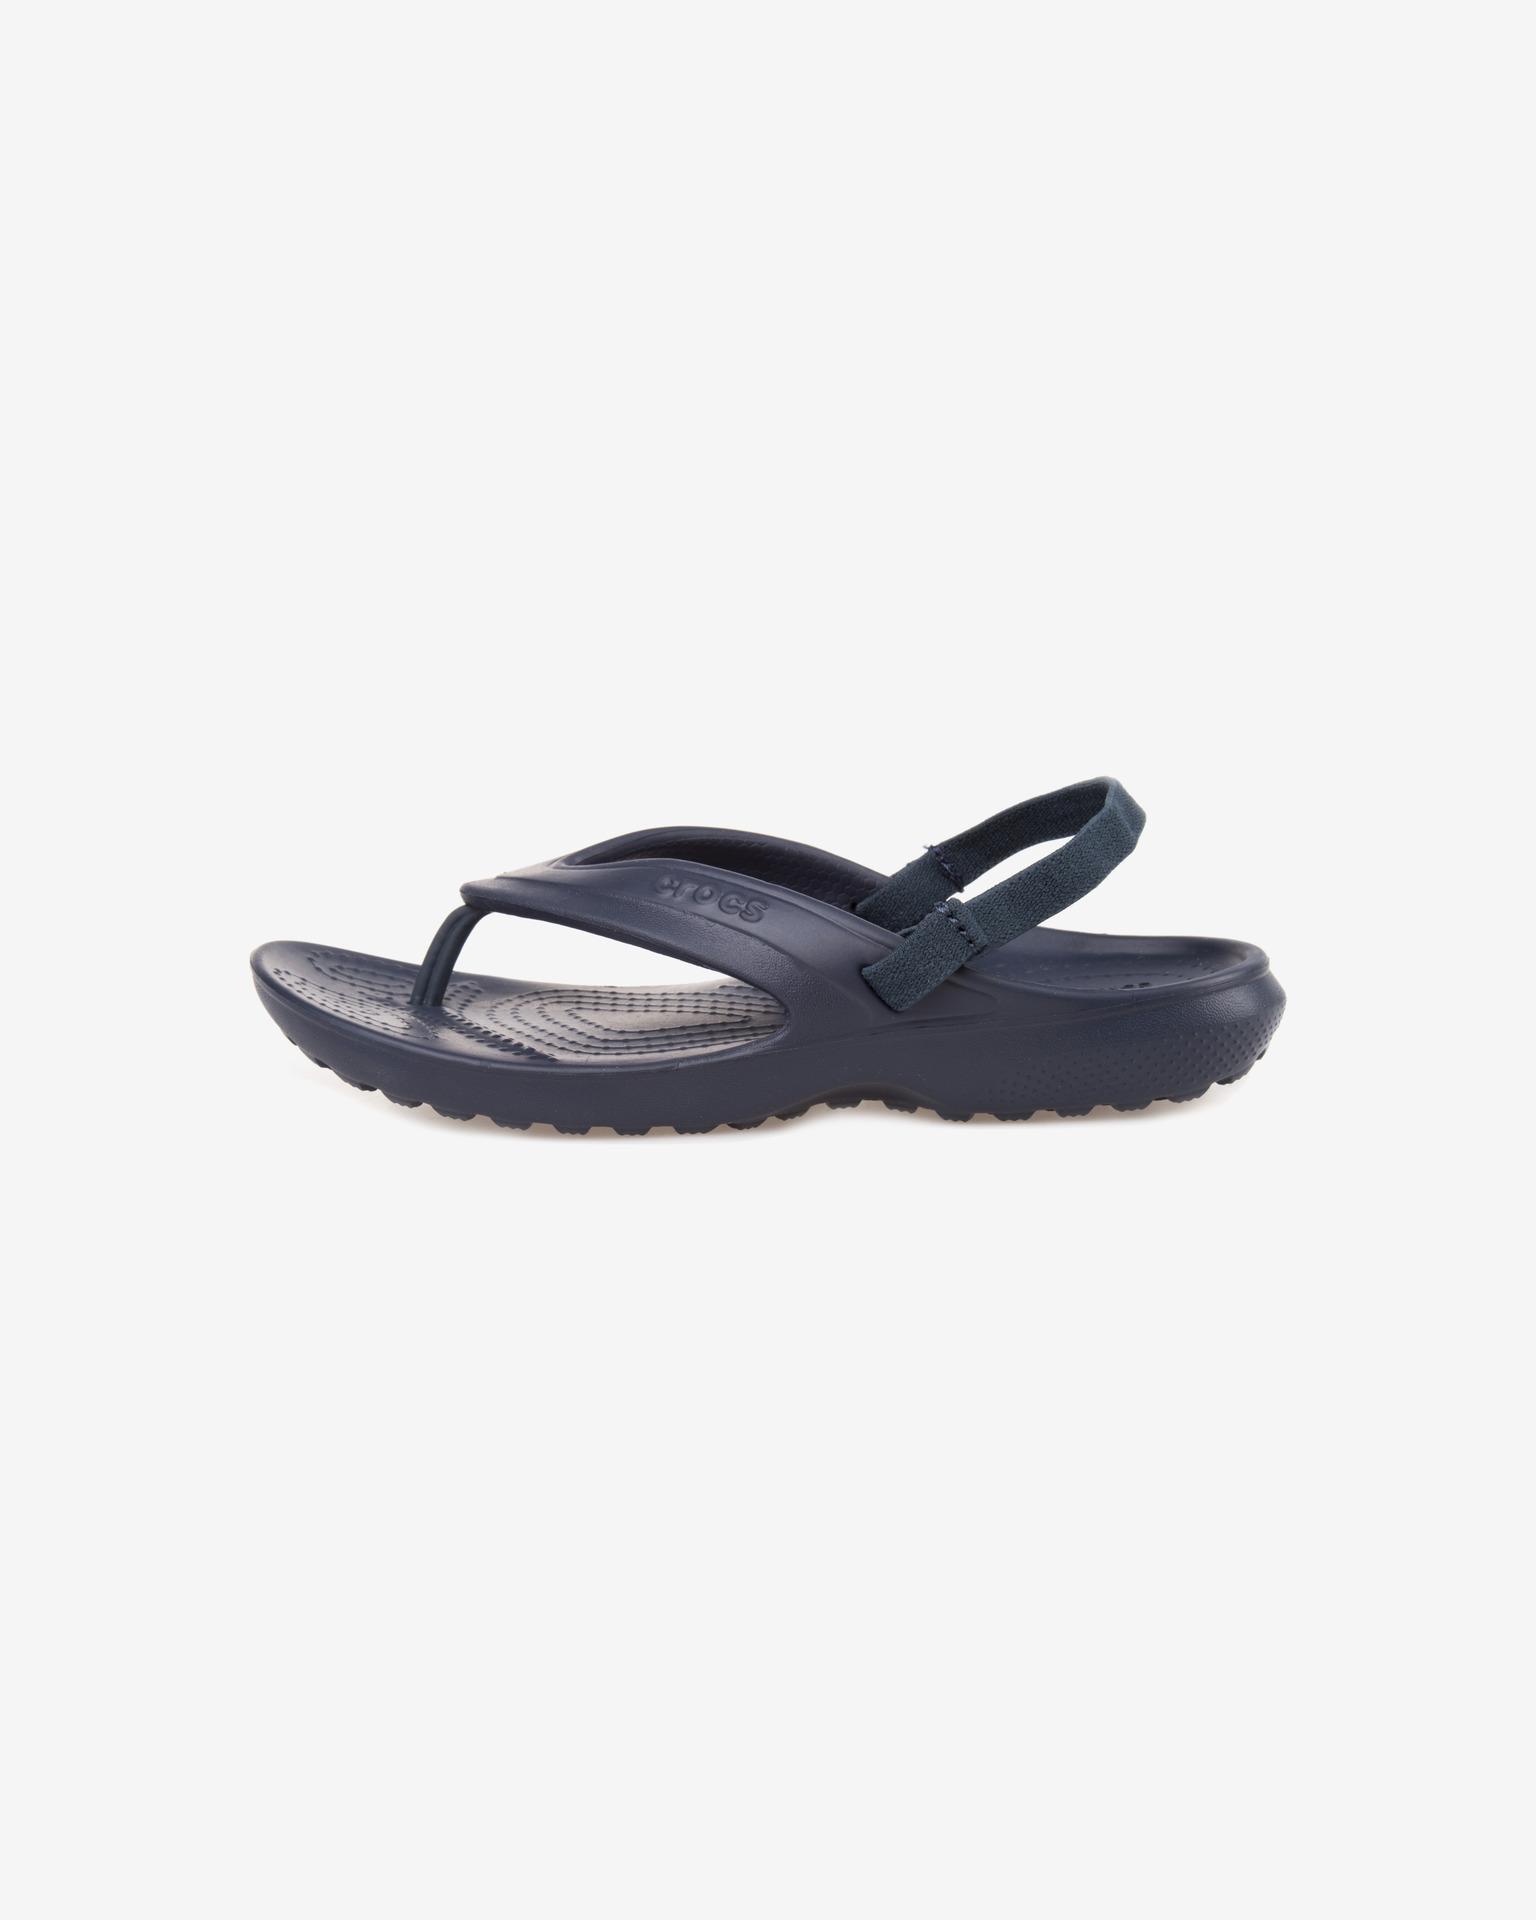 crocs classic flip kids flip flops. Black Bedroom Furniture Sets. Home Design Ideas